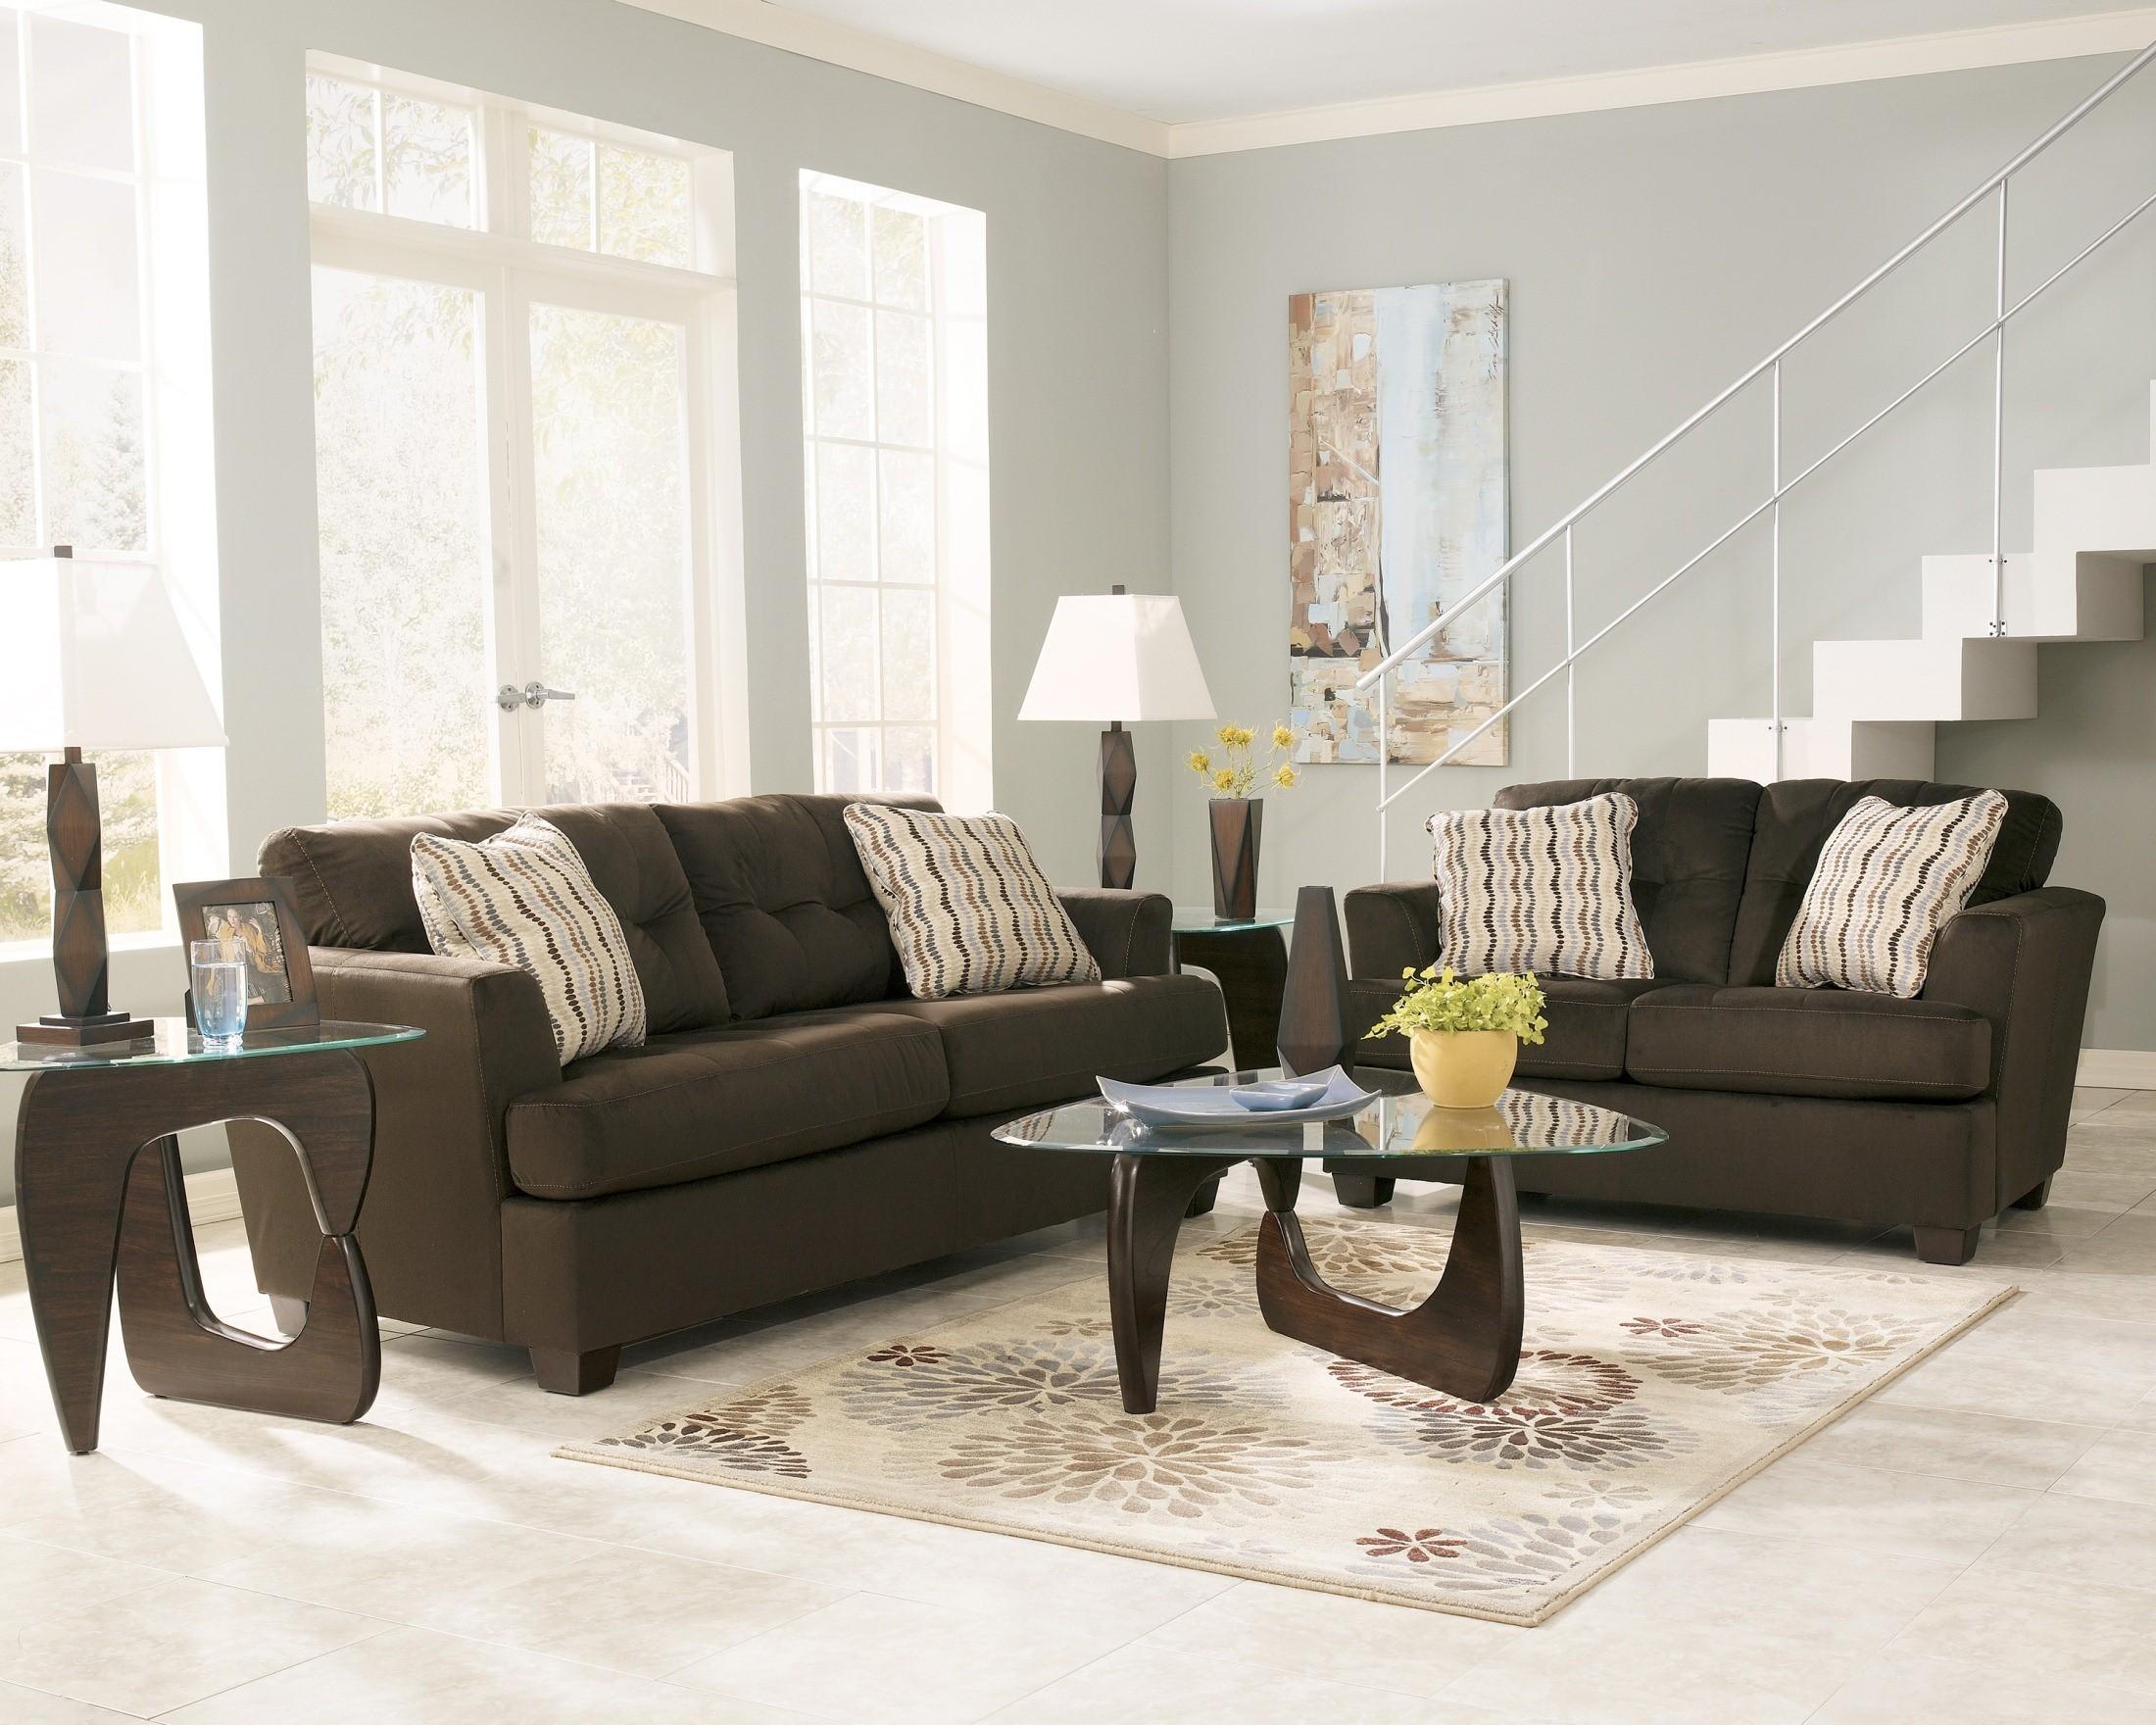 Dallas Chocolate Queen Sofa Sleeper 5650039 Sleeper Sofas